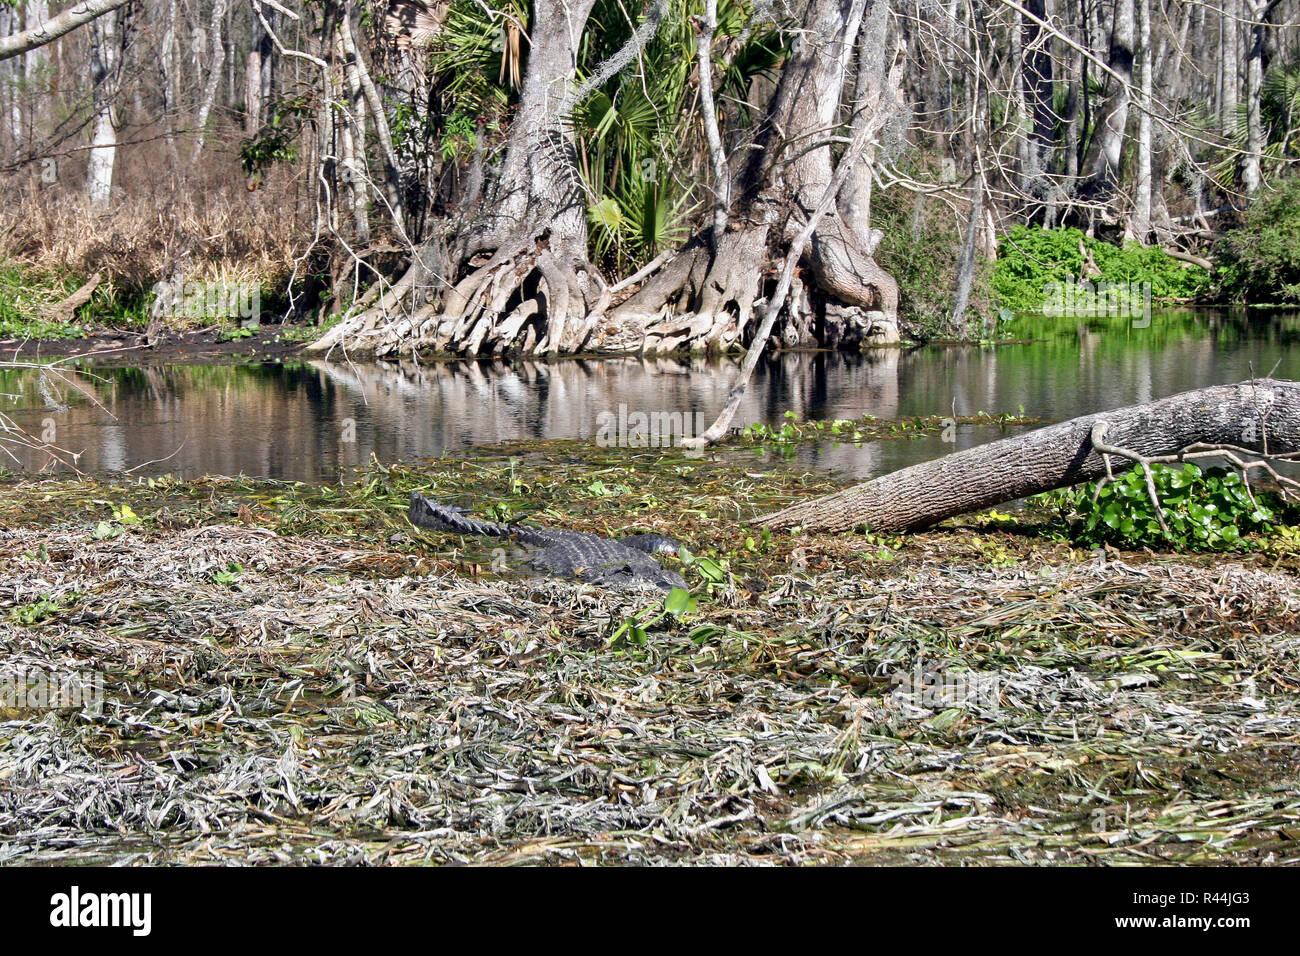 Alligator in Swamp - Stock Image